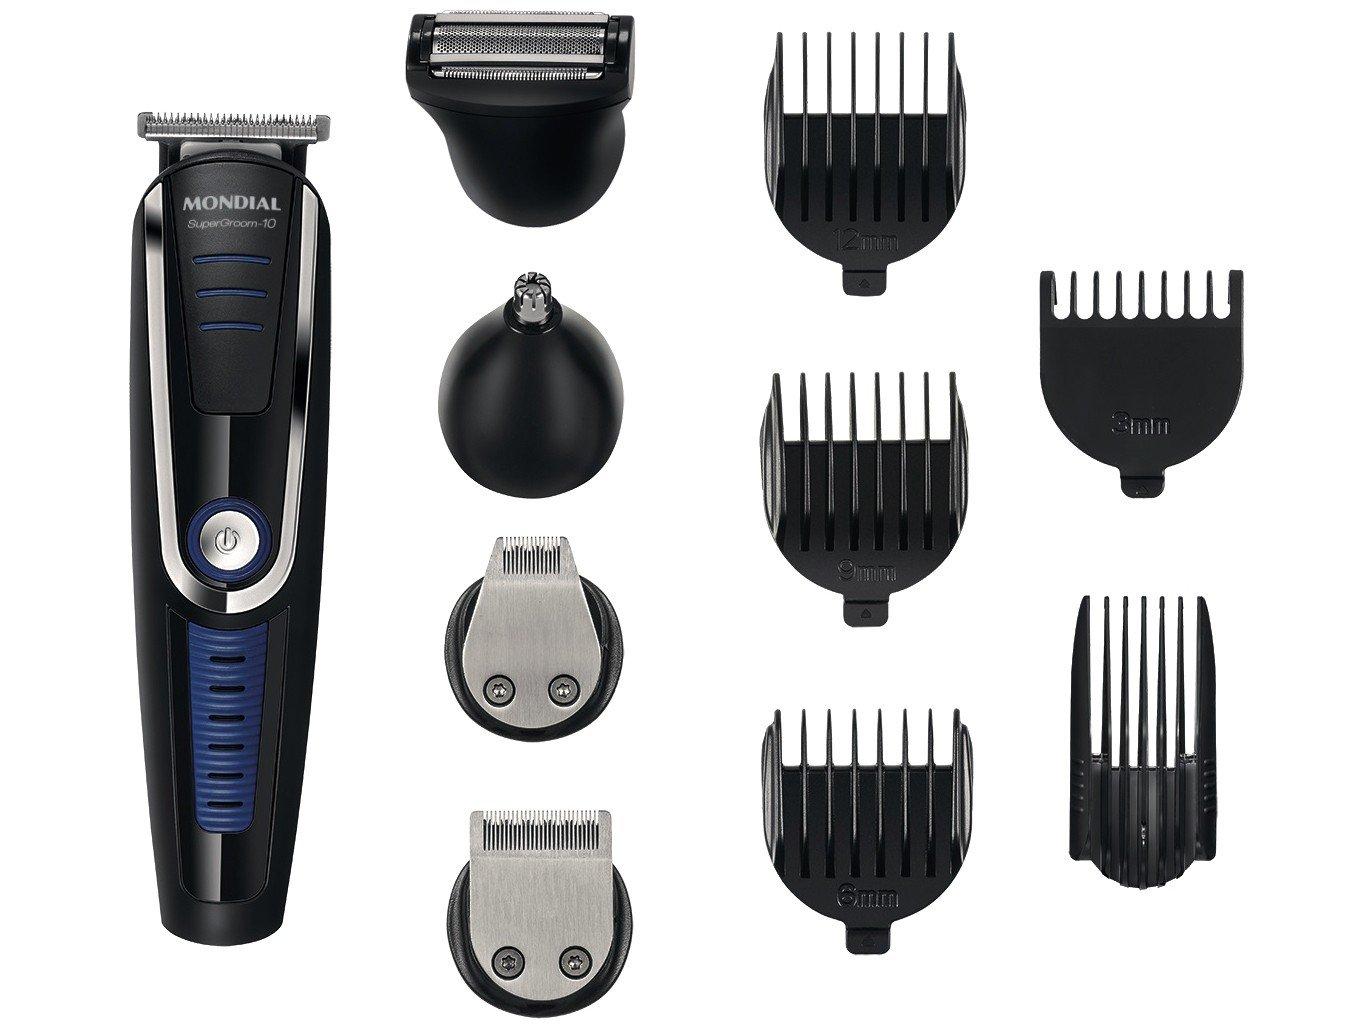 Conjunto Mondial Especial Barber KT 84 – Preto - 220v - 4